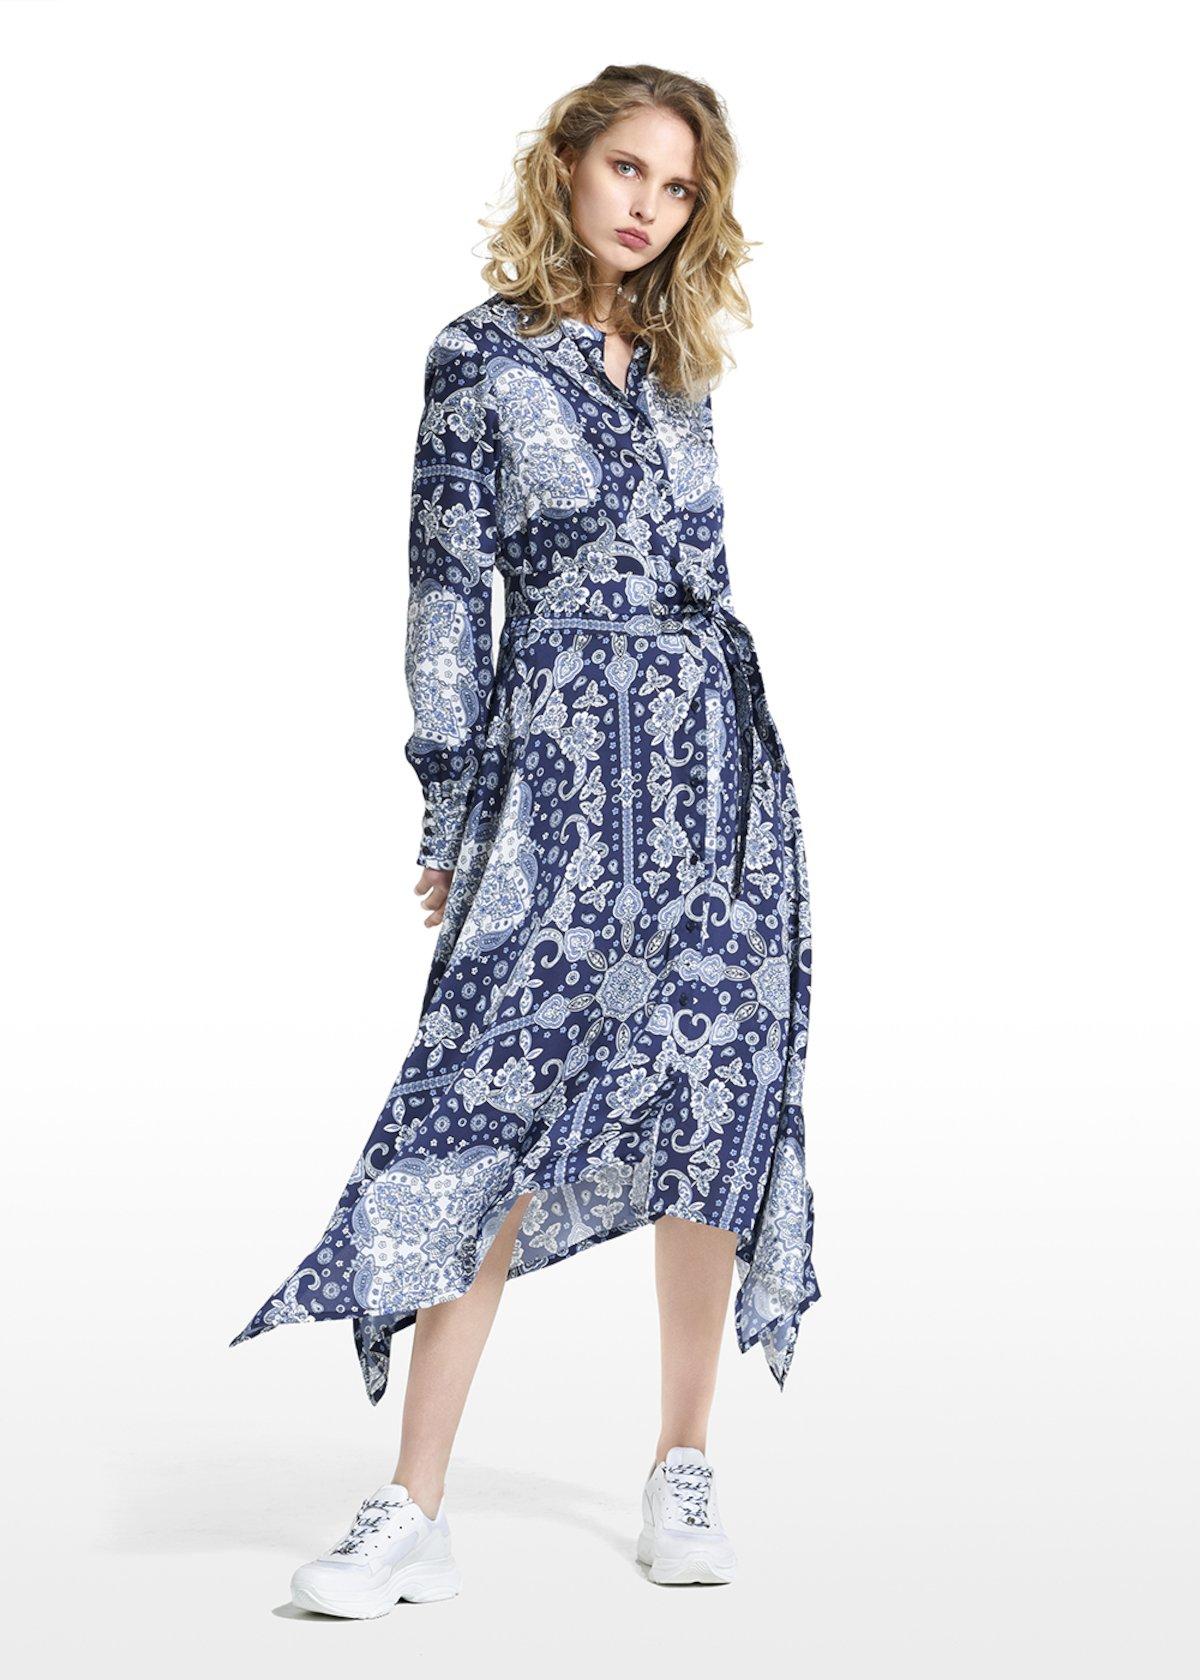 Blouse dress Artur patterned paisley bandana - Blue / White Fantasia - Woman